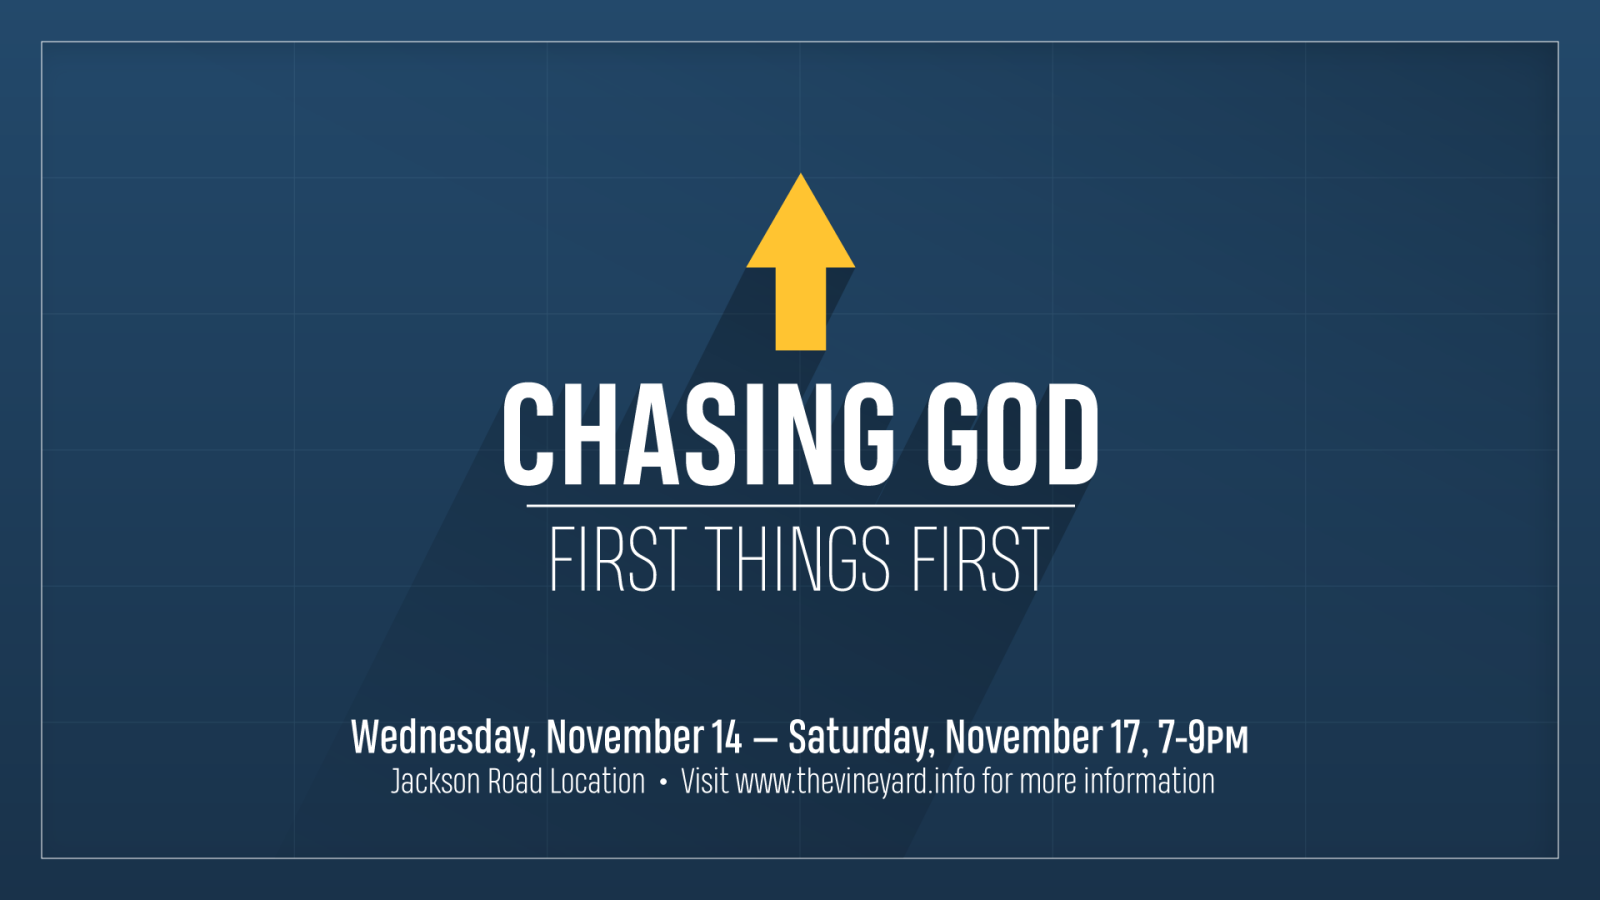 Chasing God 2018